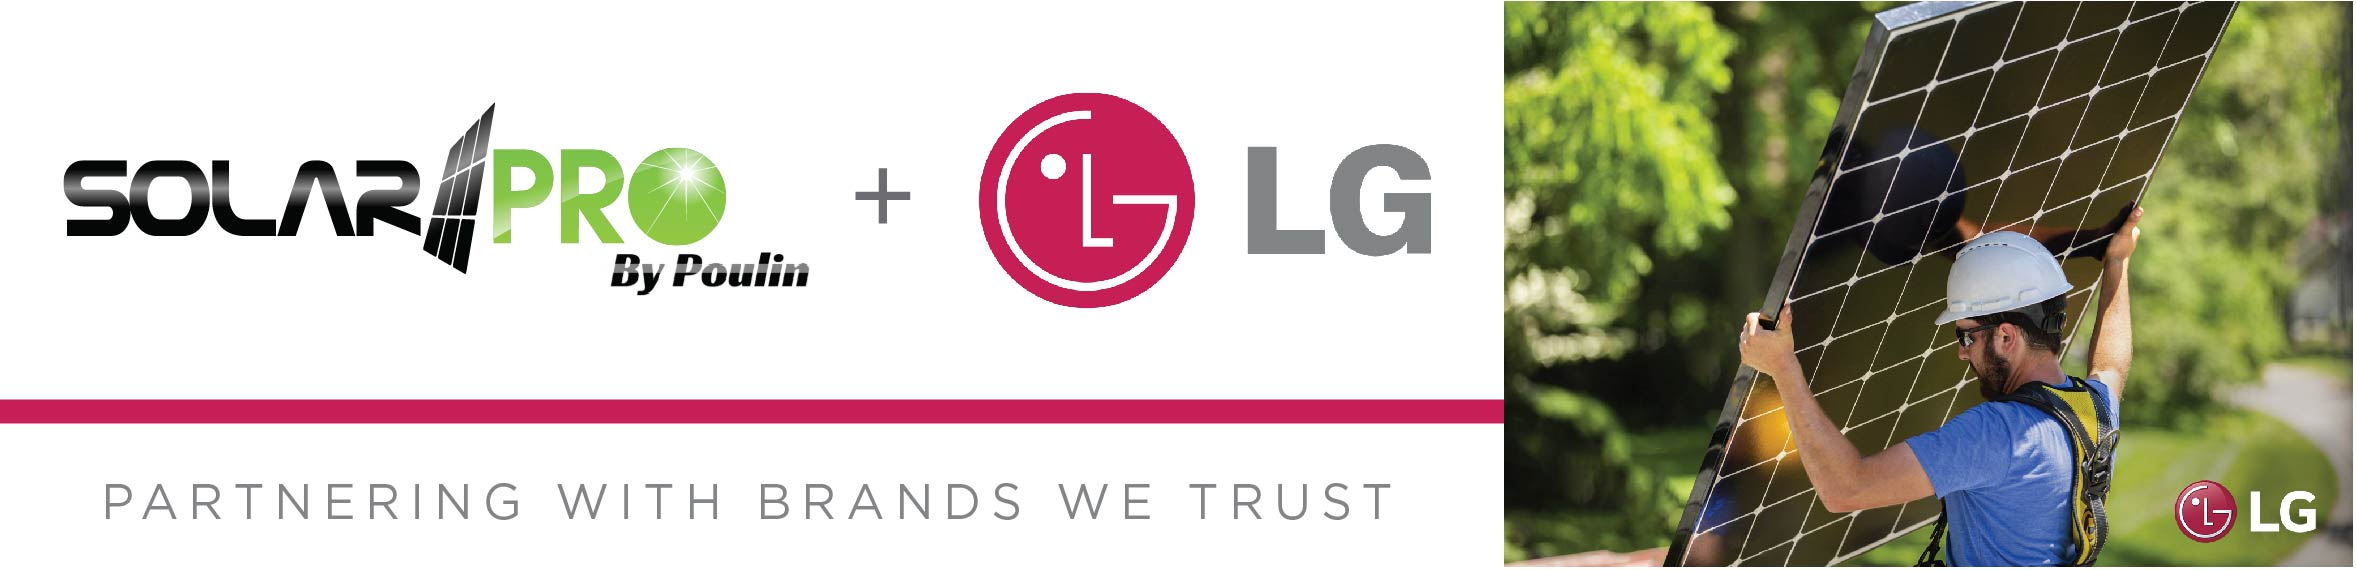 LG-website banner-10